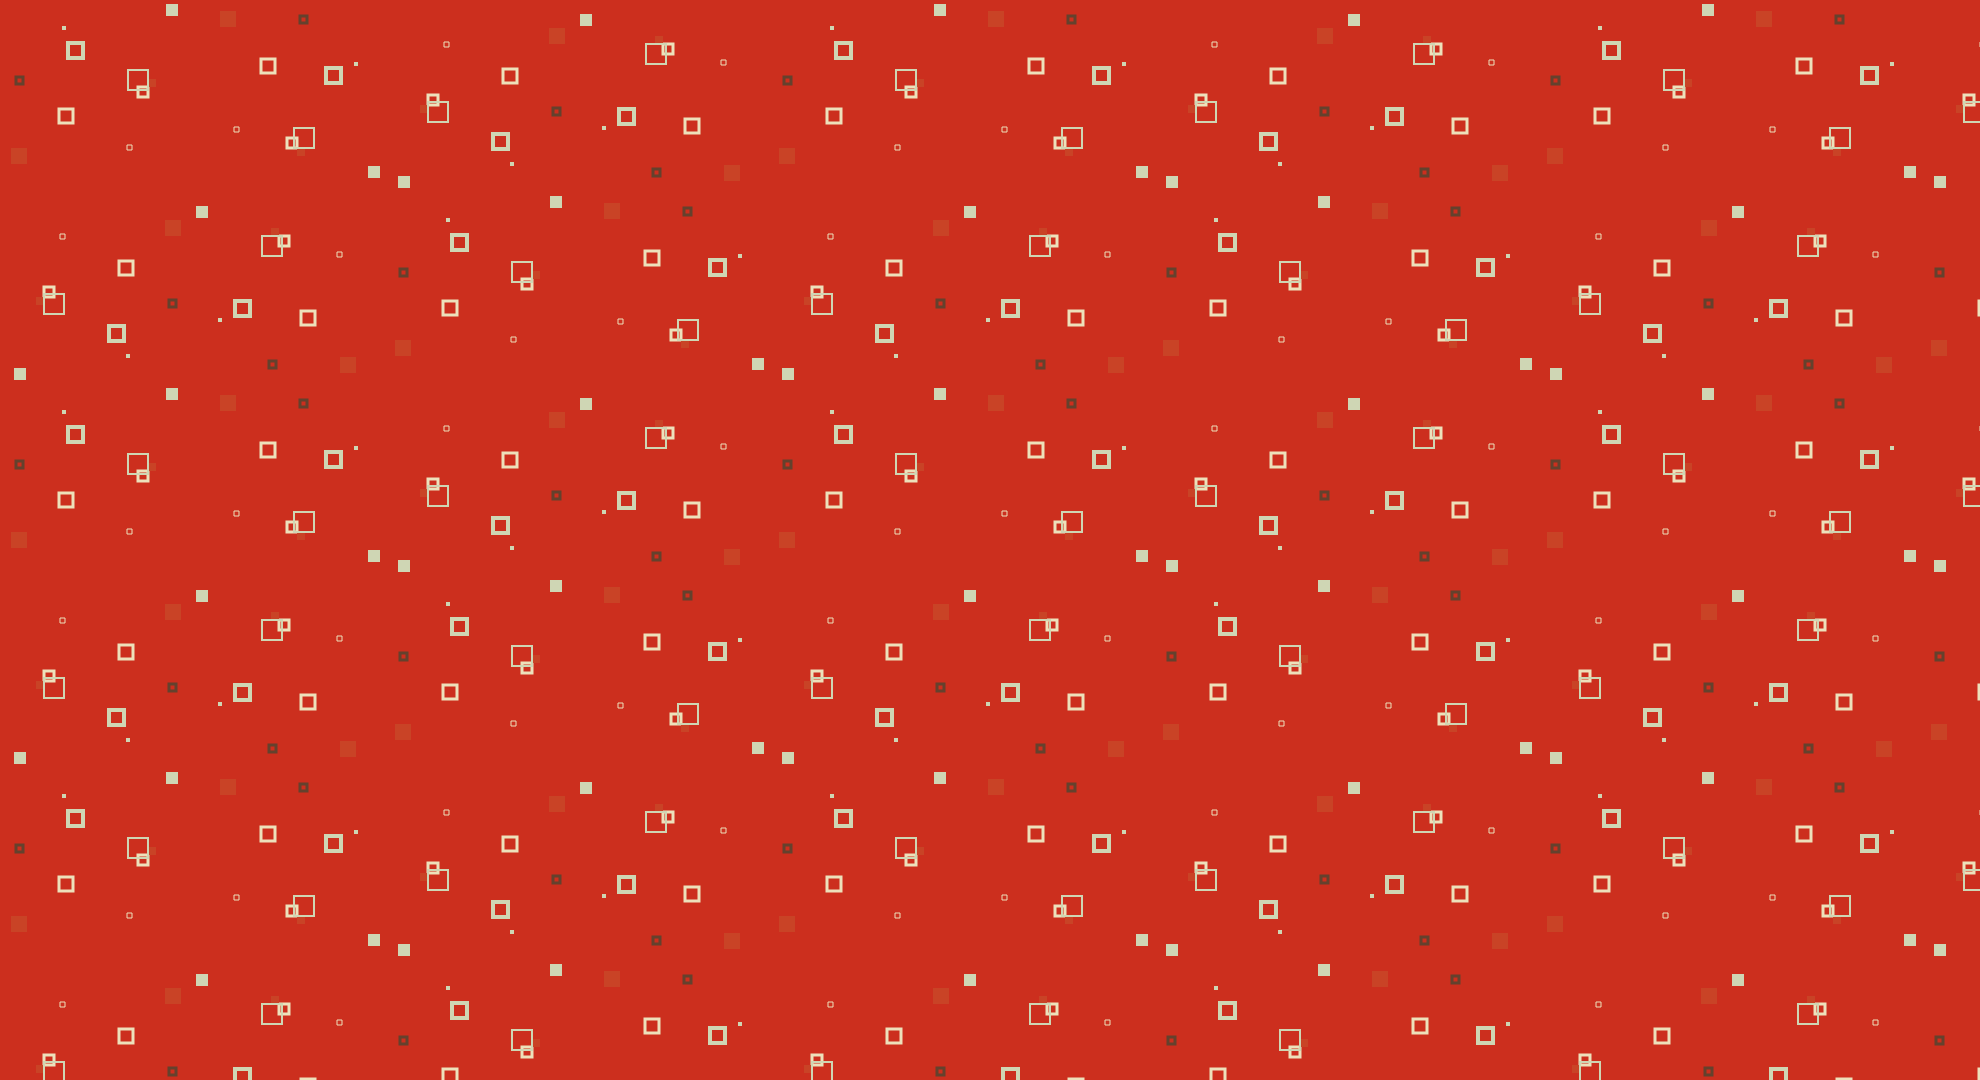 25 Awesome Patterns Made By Random Pattern Generator - Codegena